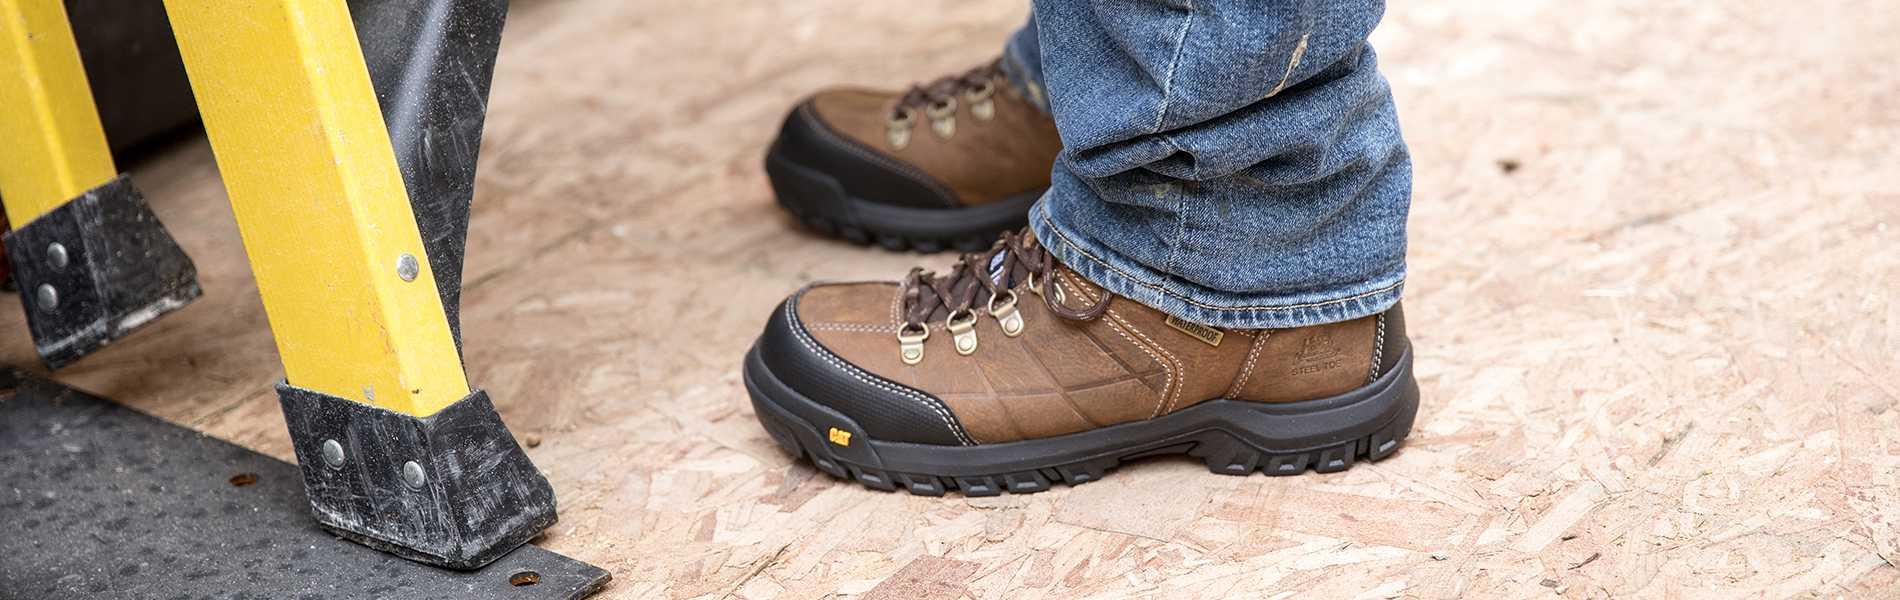 d5e99b52066 Threshold Waterproof Steel Toe Work Boot